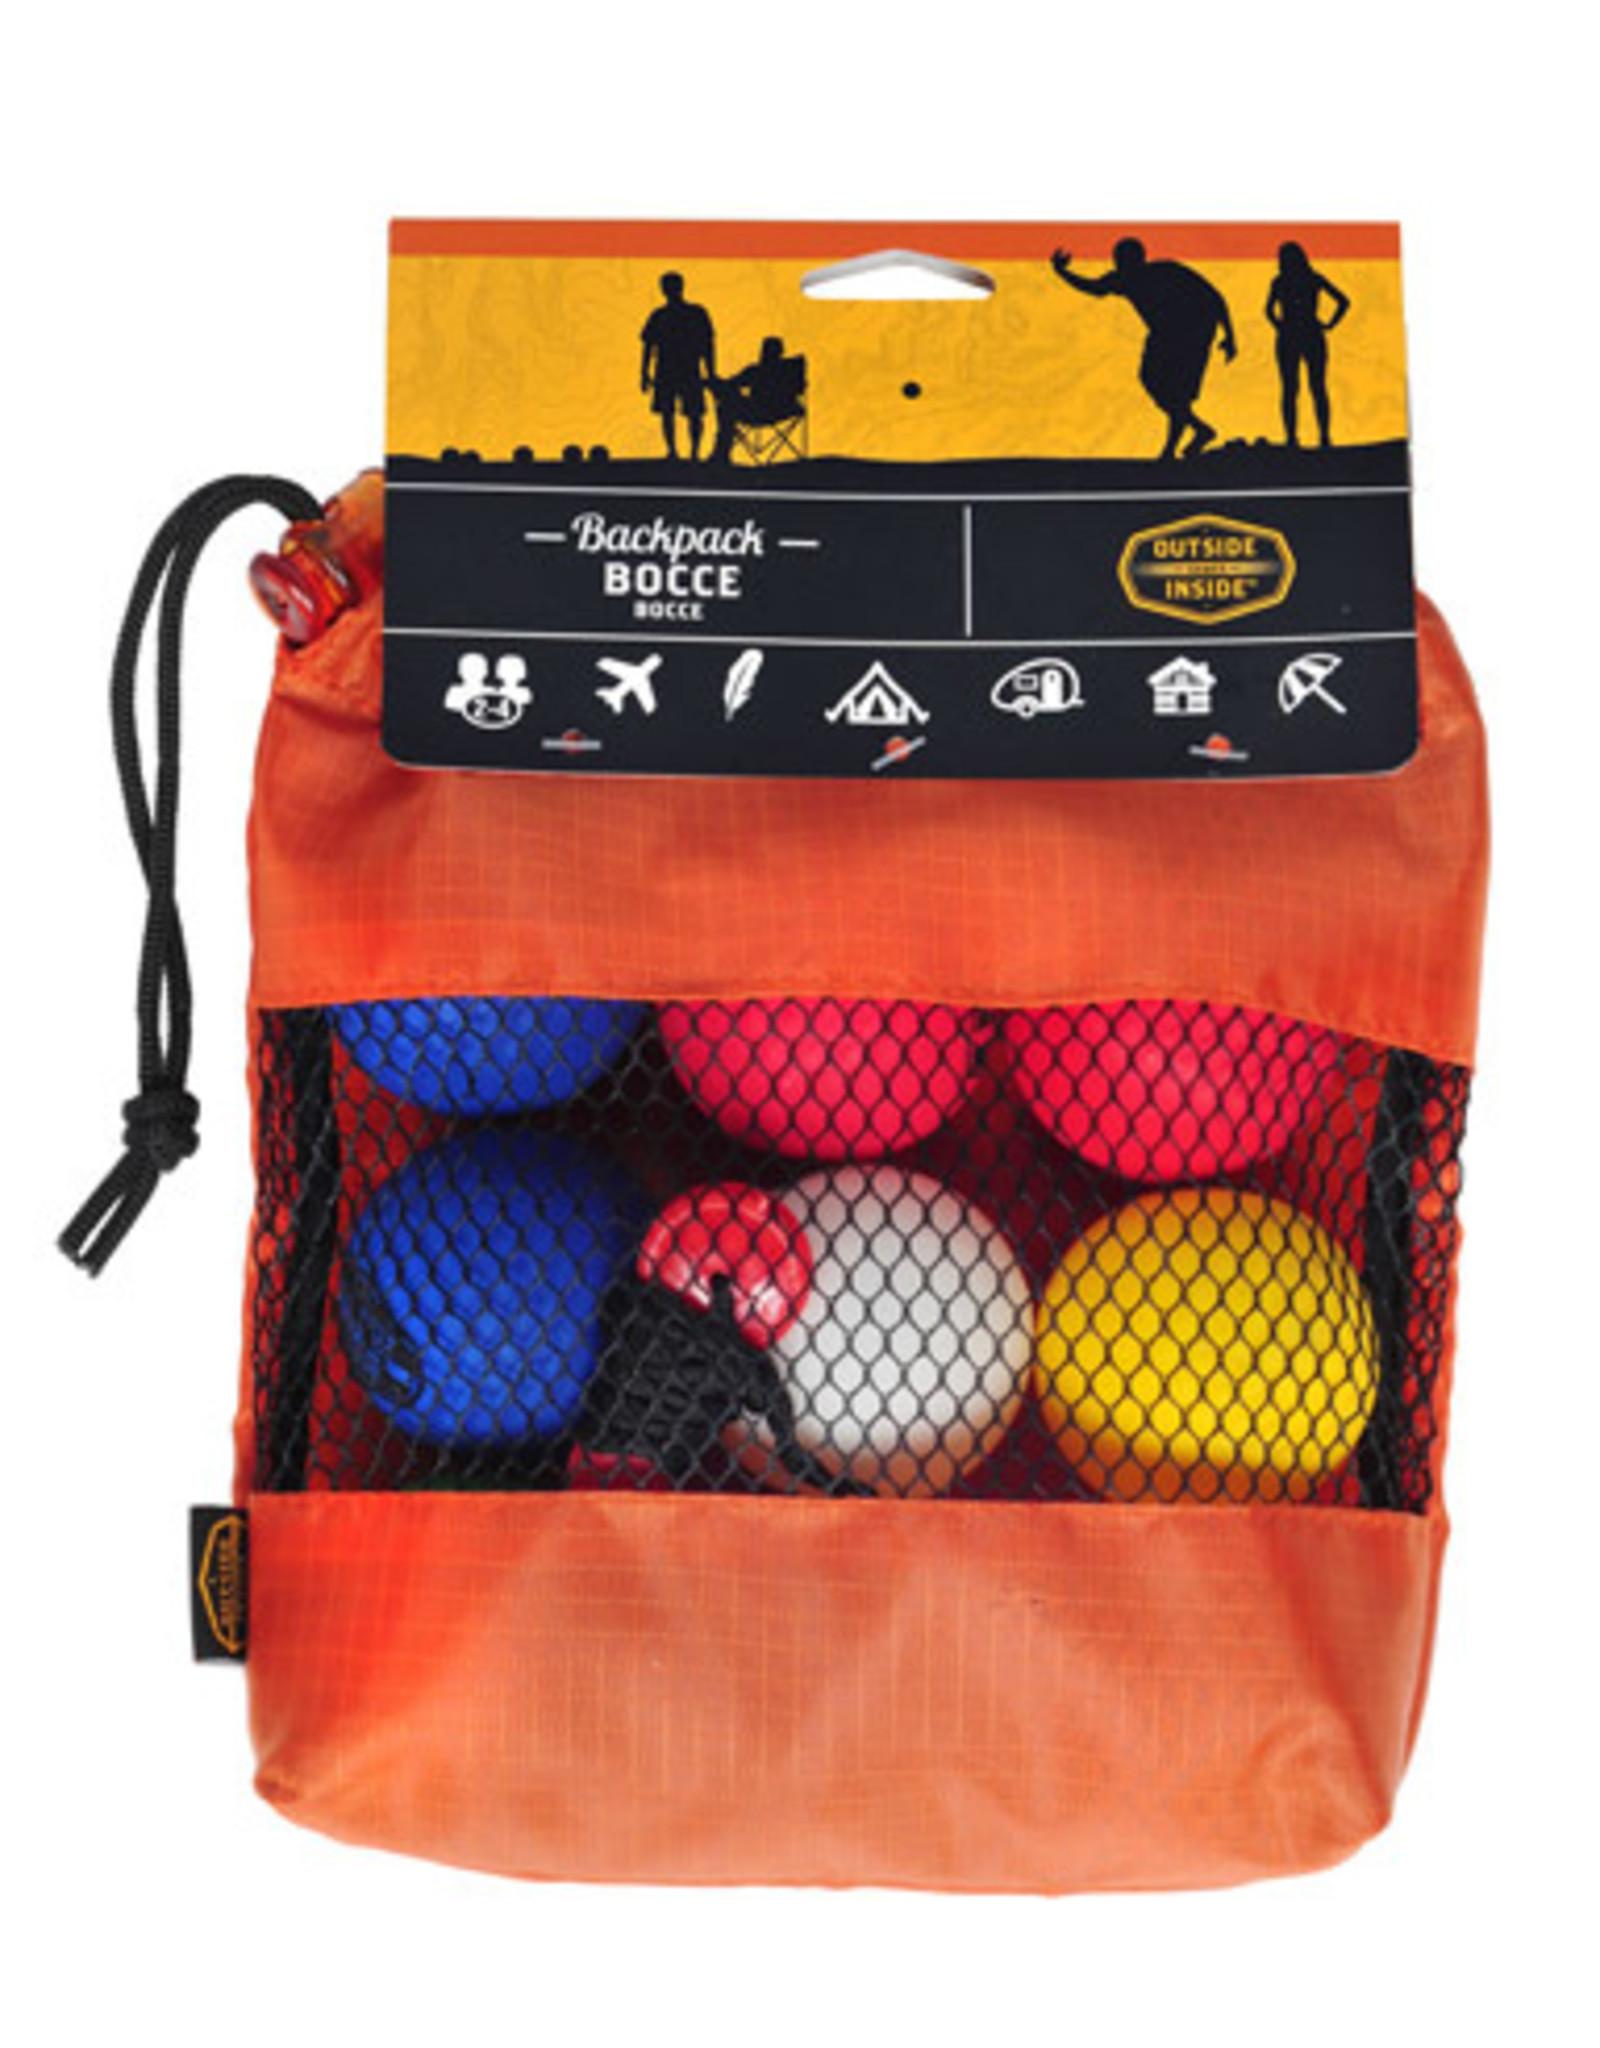 OUTSIDE INSIDE Backpack Bocce